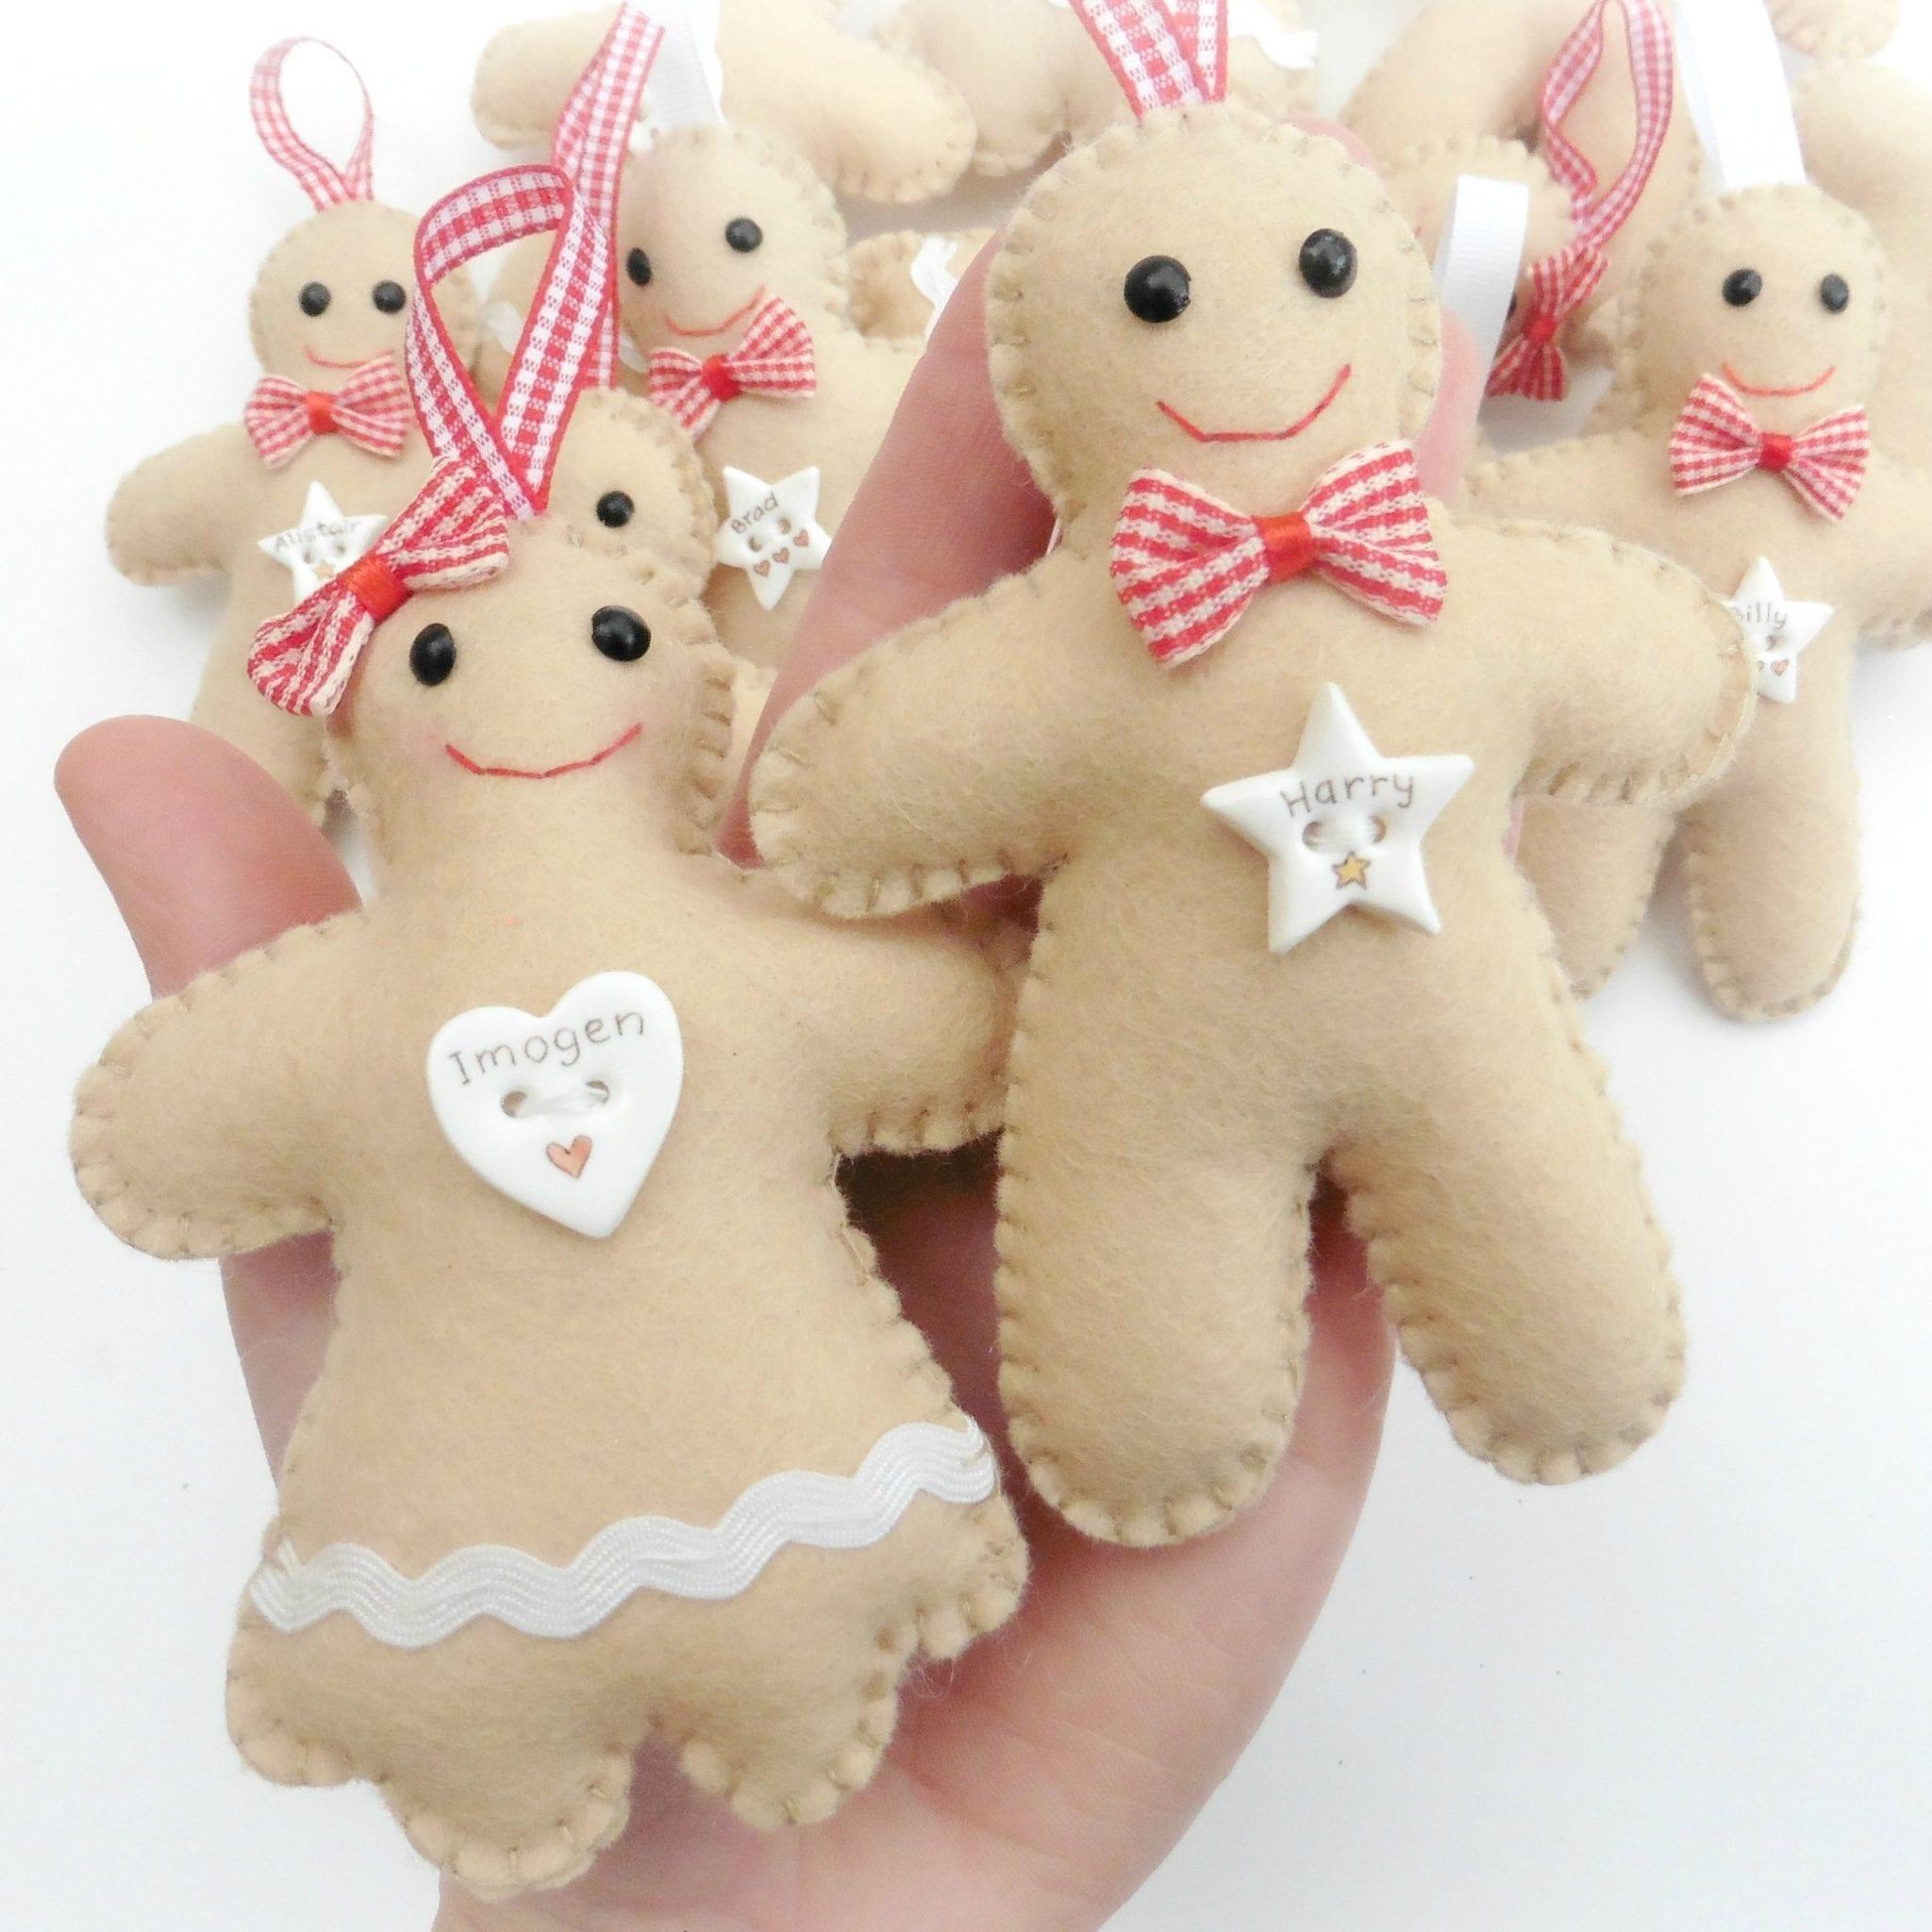 Personalised Felt Gingerbread Decoration